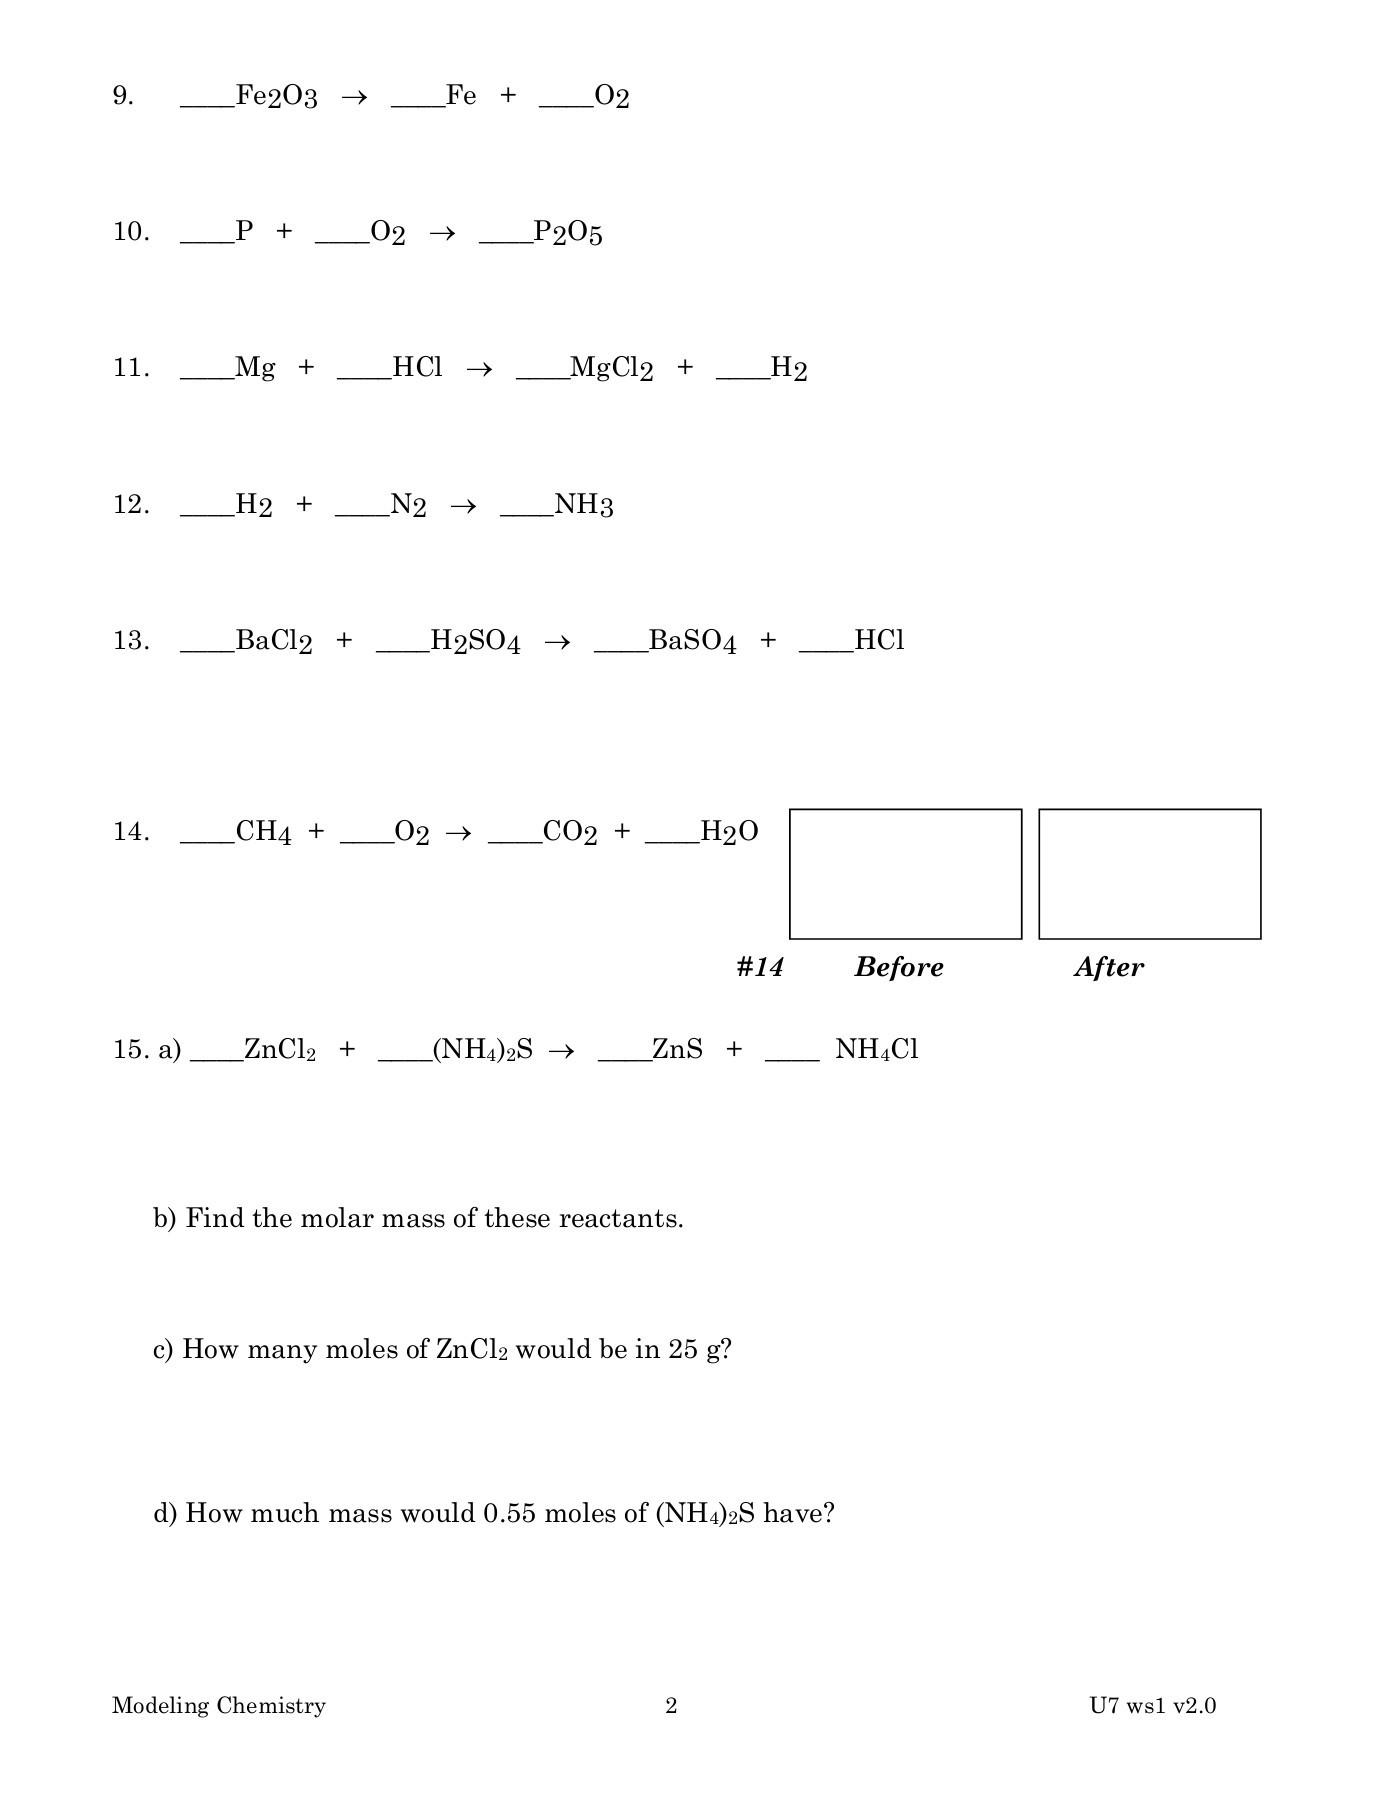 Modeling Chemistry Unit 6 Worksheet 1 Answer Key